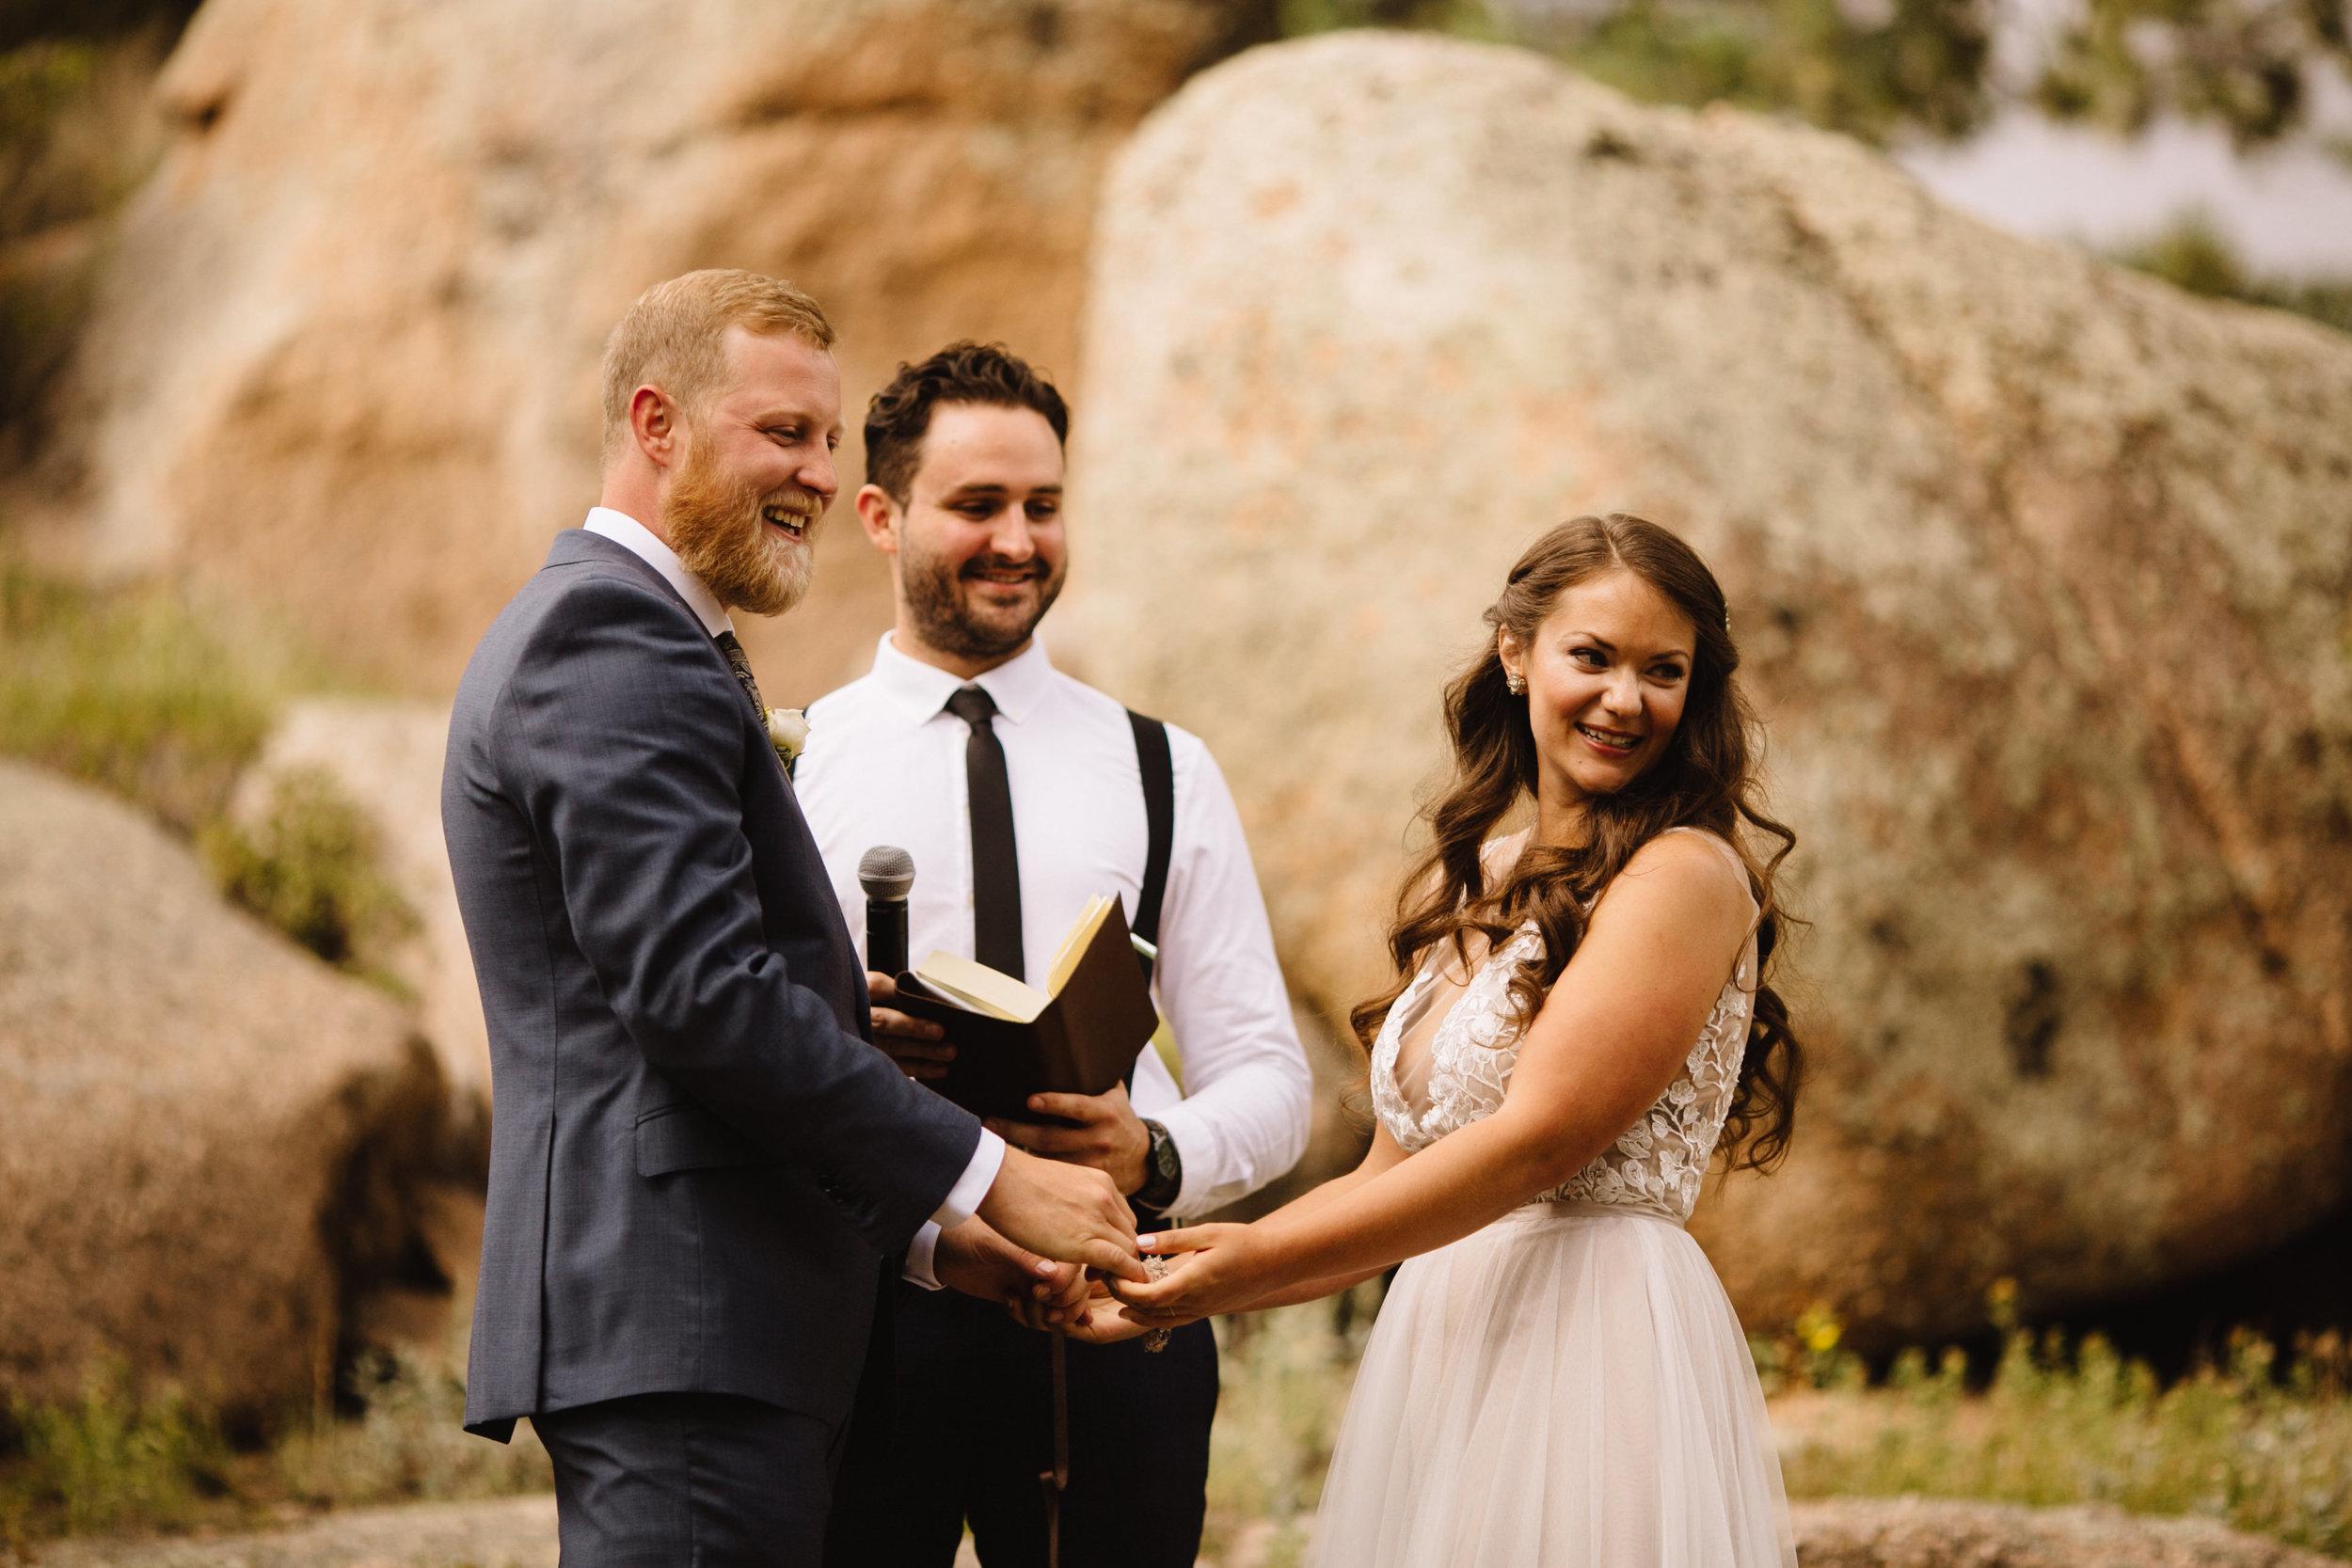 Liz Osban Photography Vedauwoo Buford Wyoming Happy Jack Wedding Elopement Destination Small Forest Cheyenne Laramie Medicine Bow National Forest Ceremony Sarah Taylor11.jpg